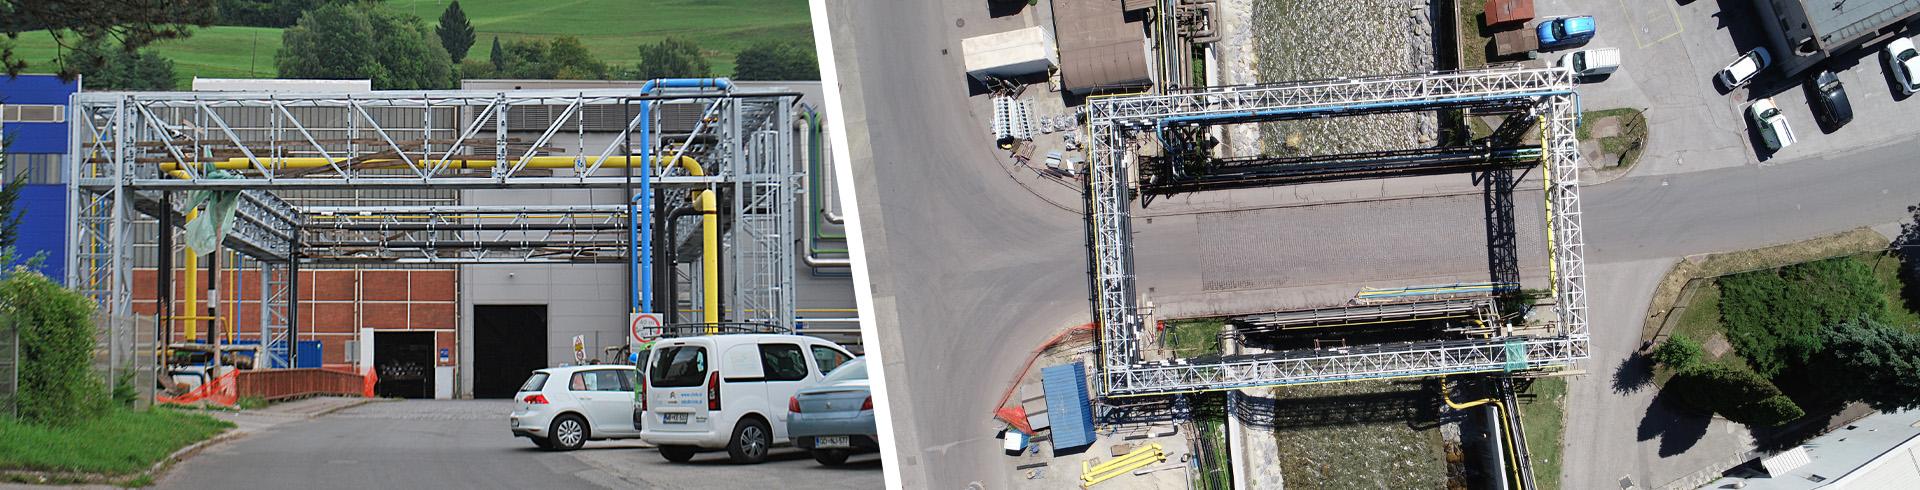 Energetski most za dvig instalacijskih vodov